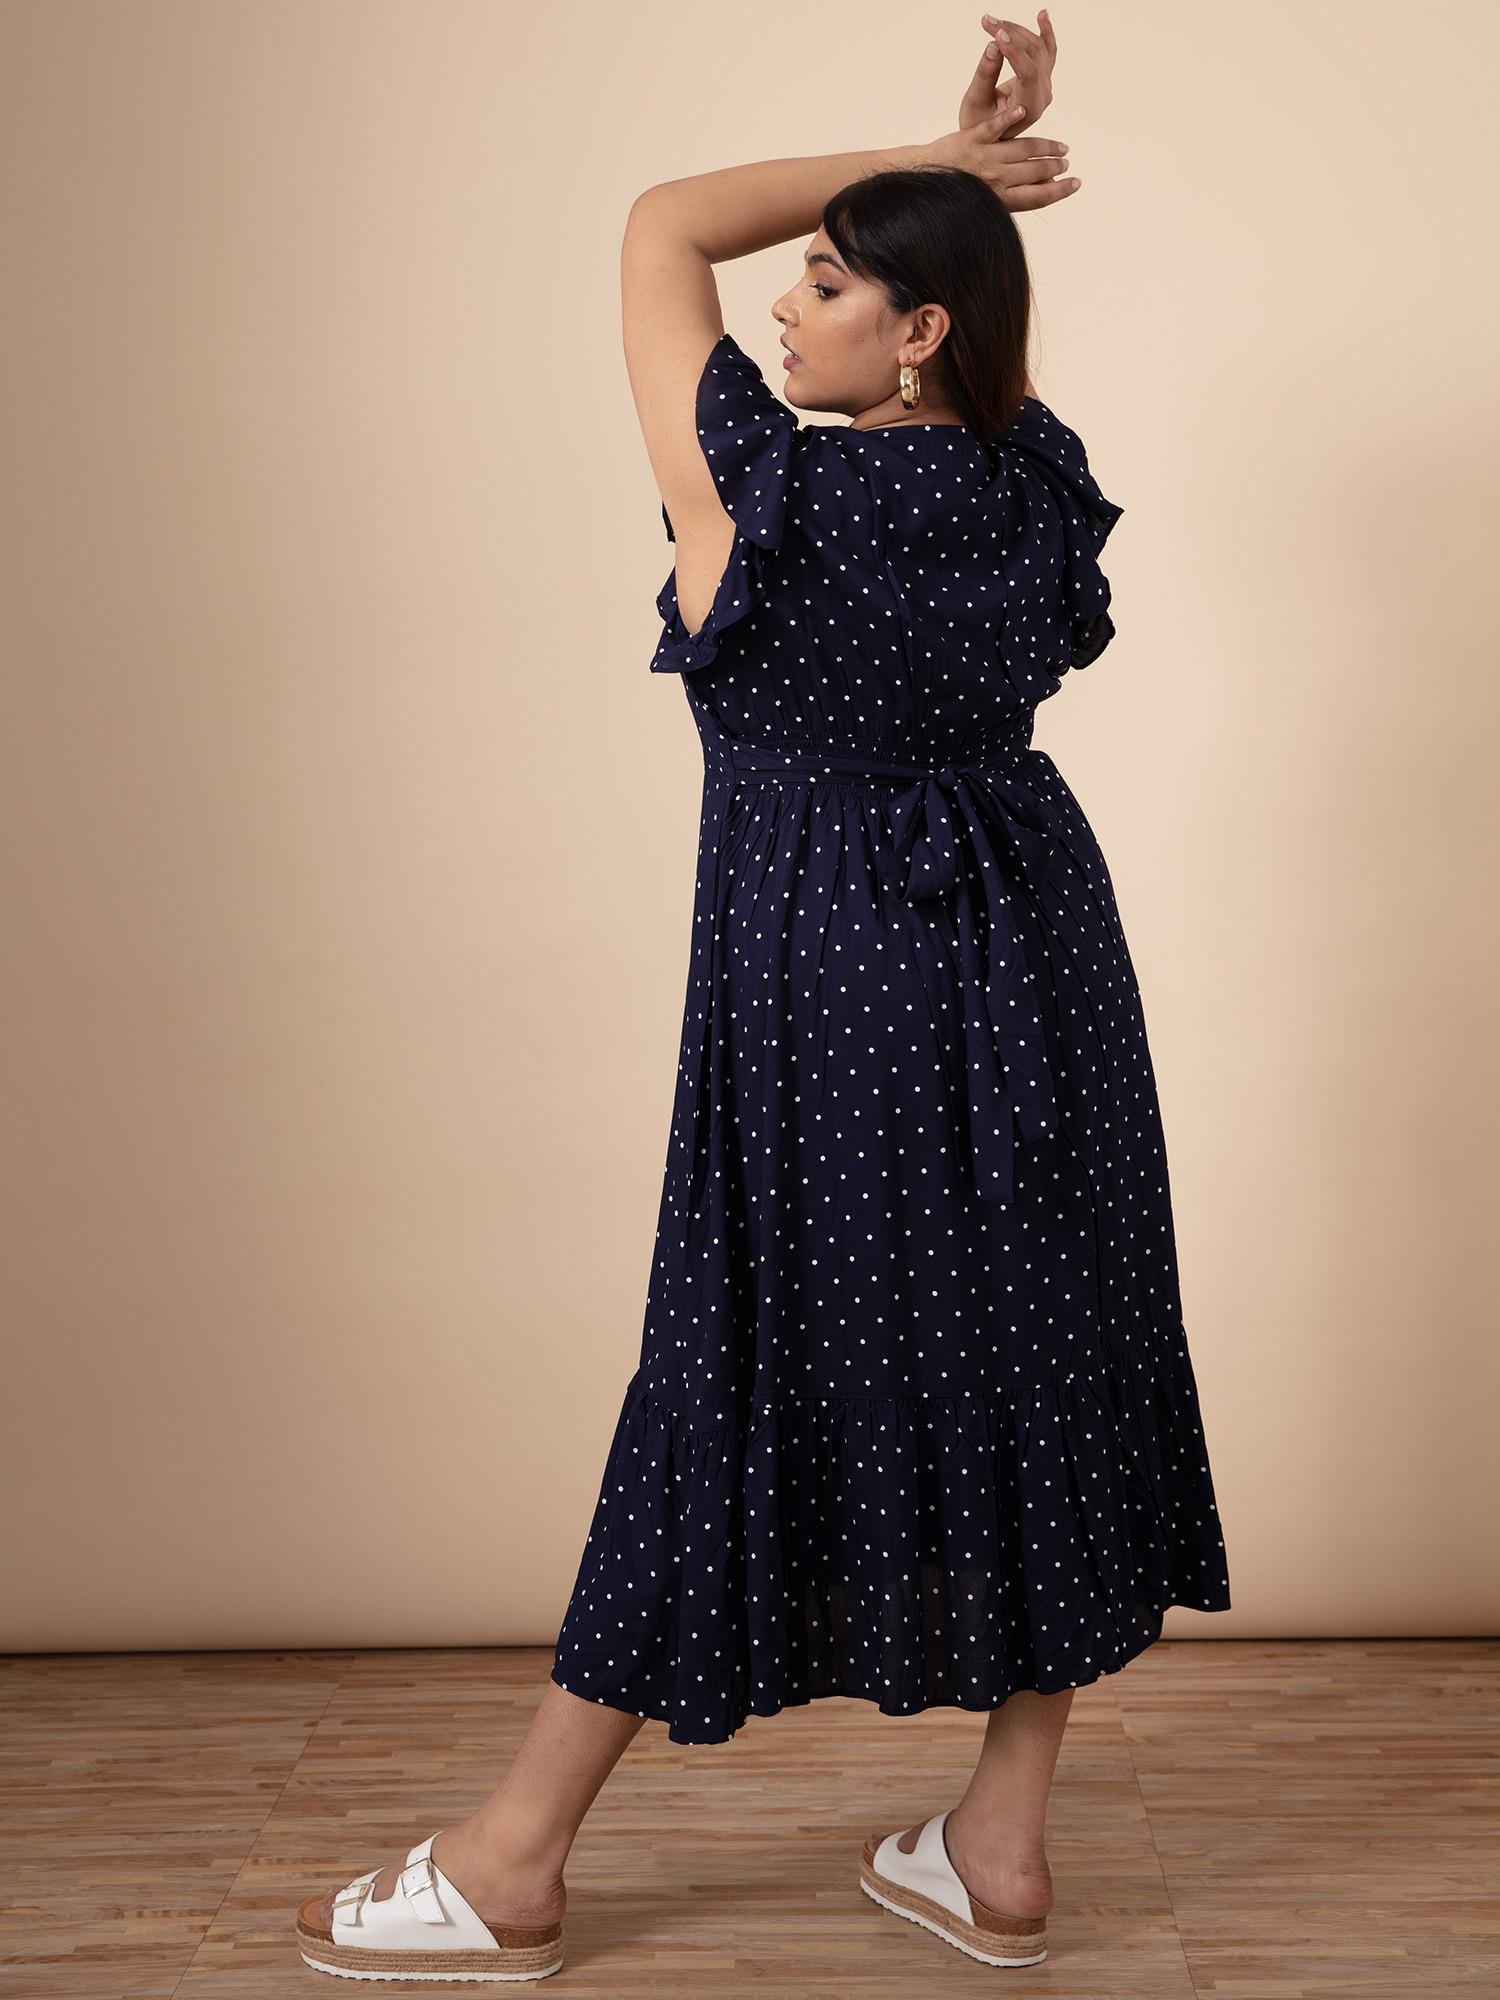 Dresses-Hold You Back Dress3